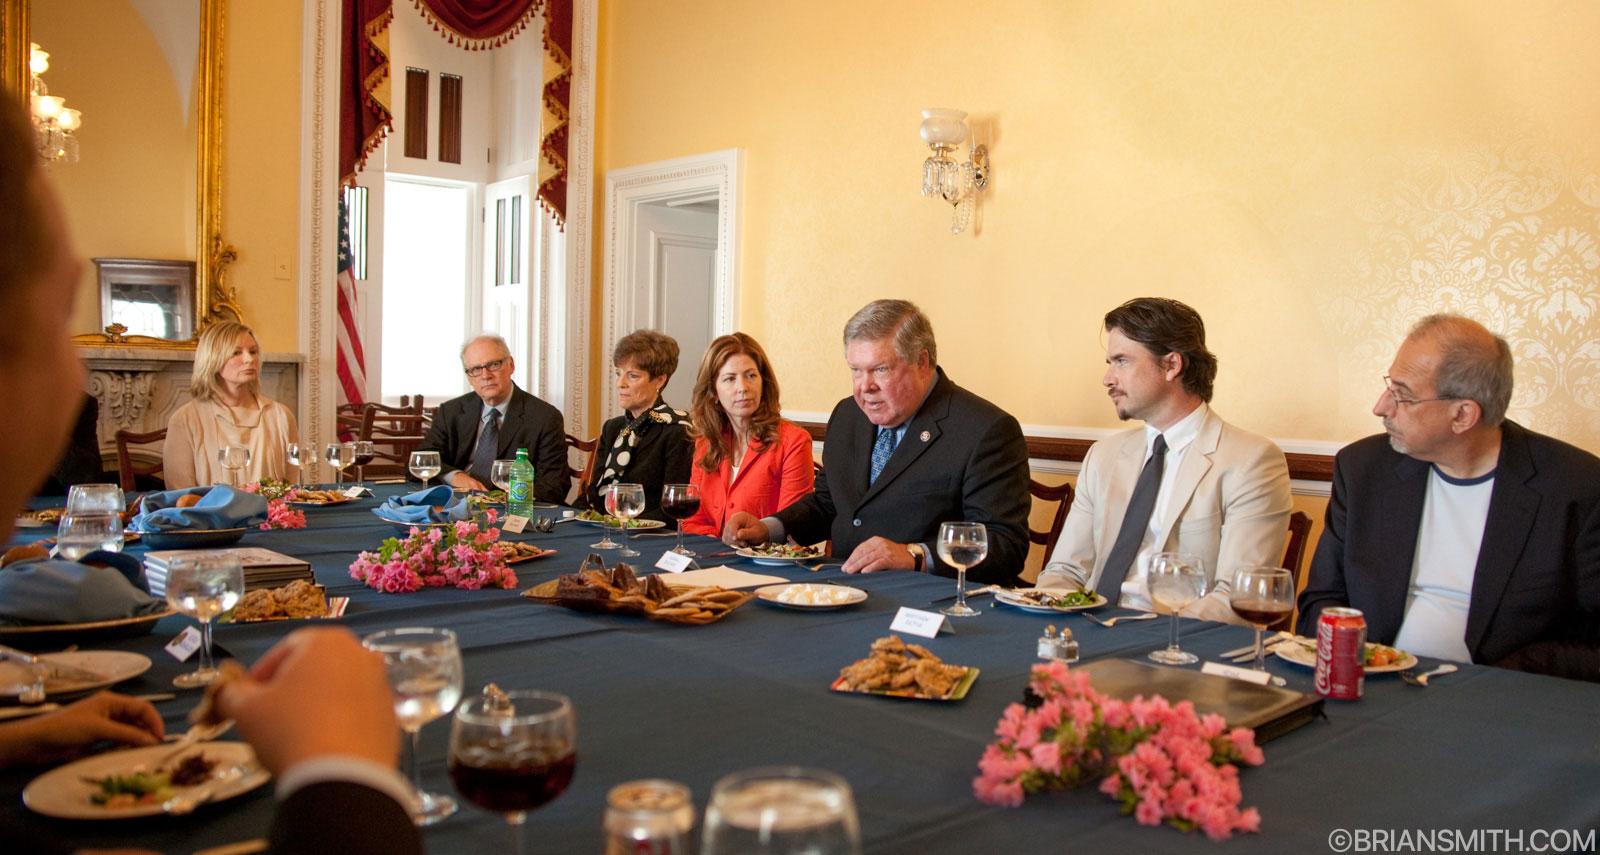 The Creative Coalition Luncheon on Capitol Hill, Washington, D.C